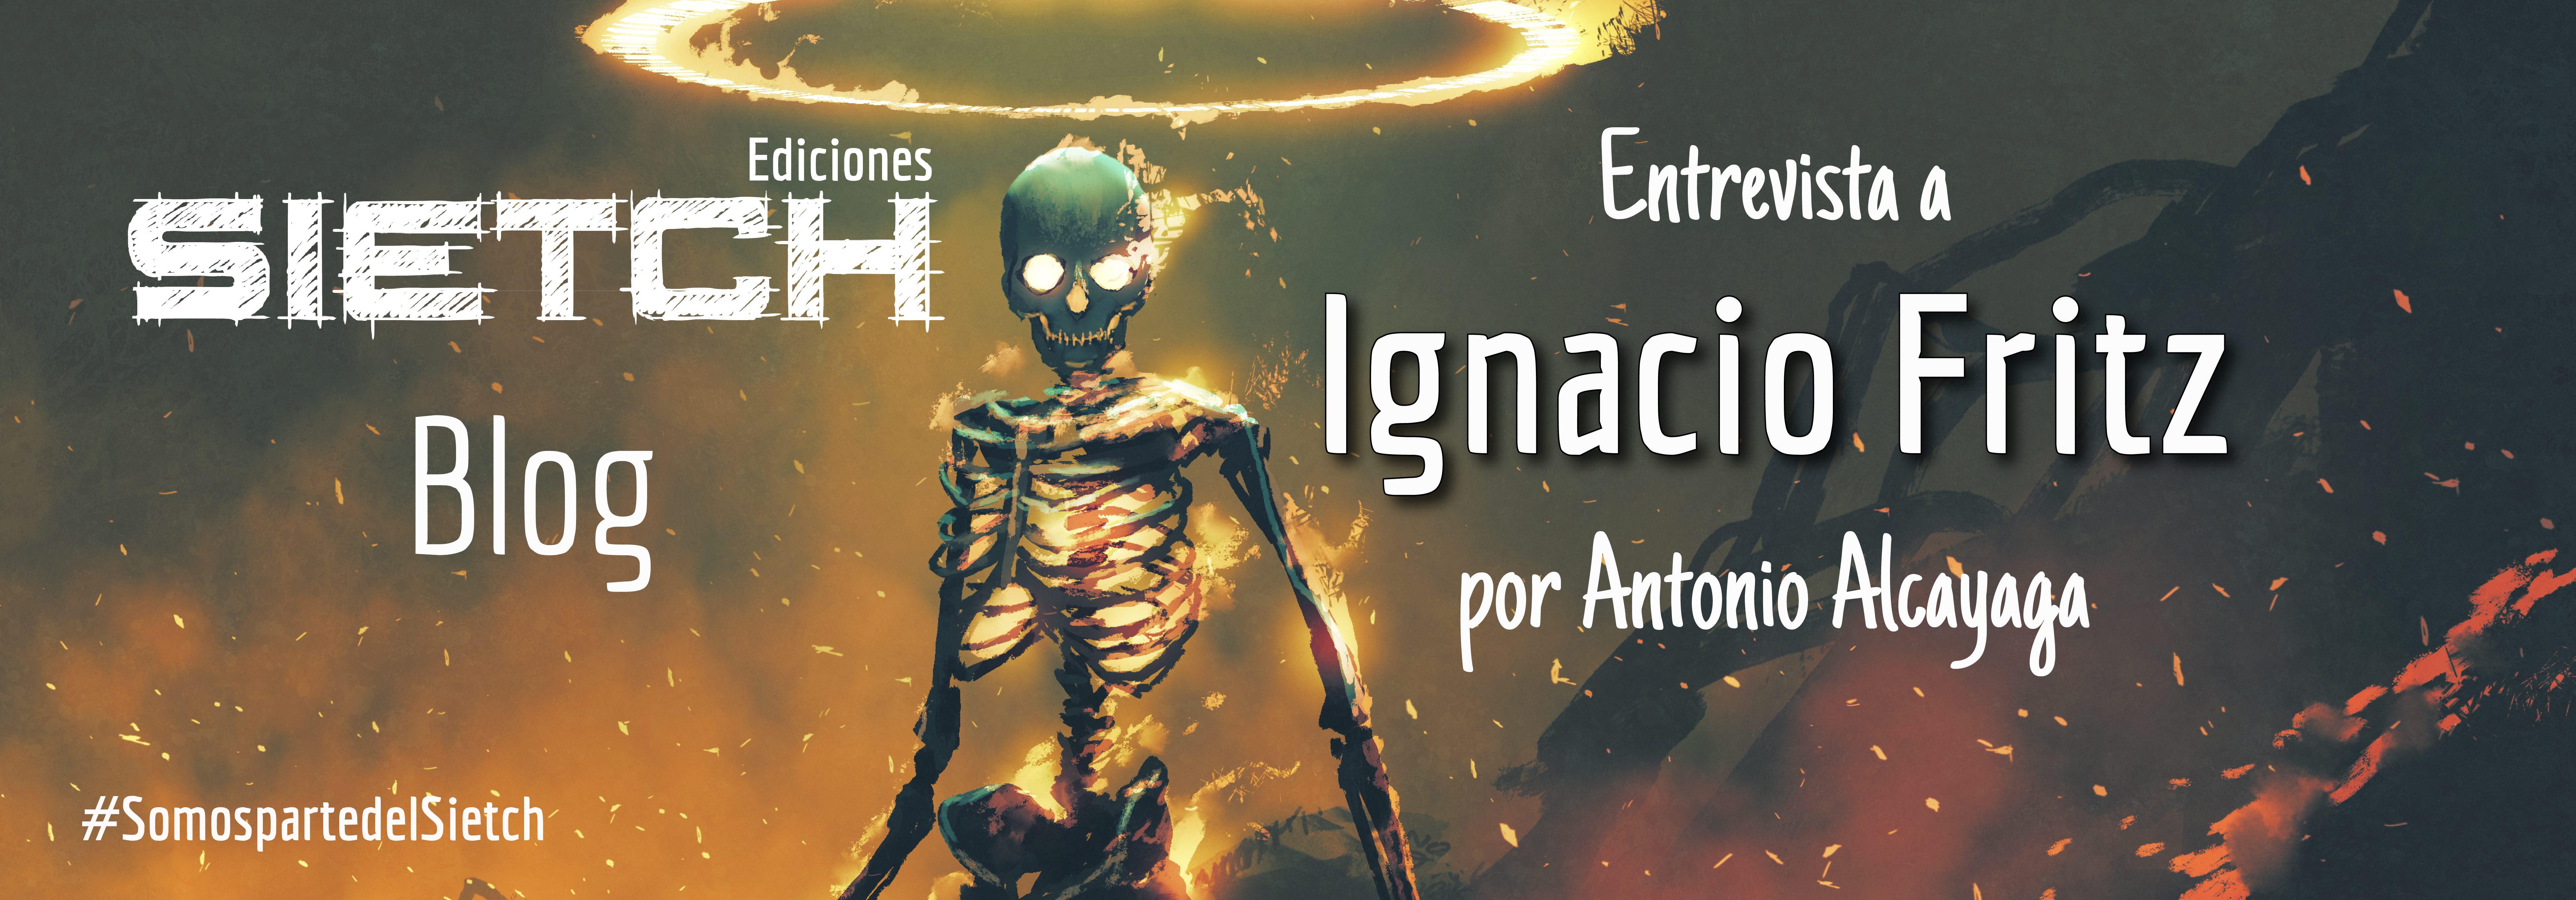 Entrevista a Ignacio Fritz